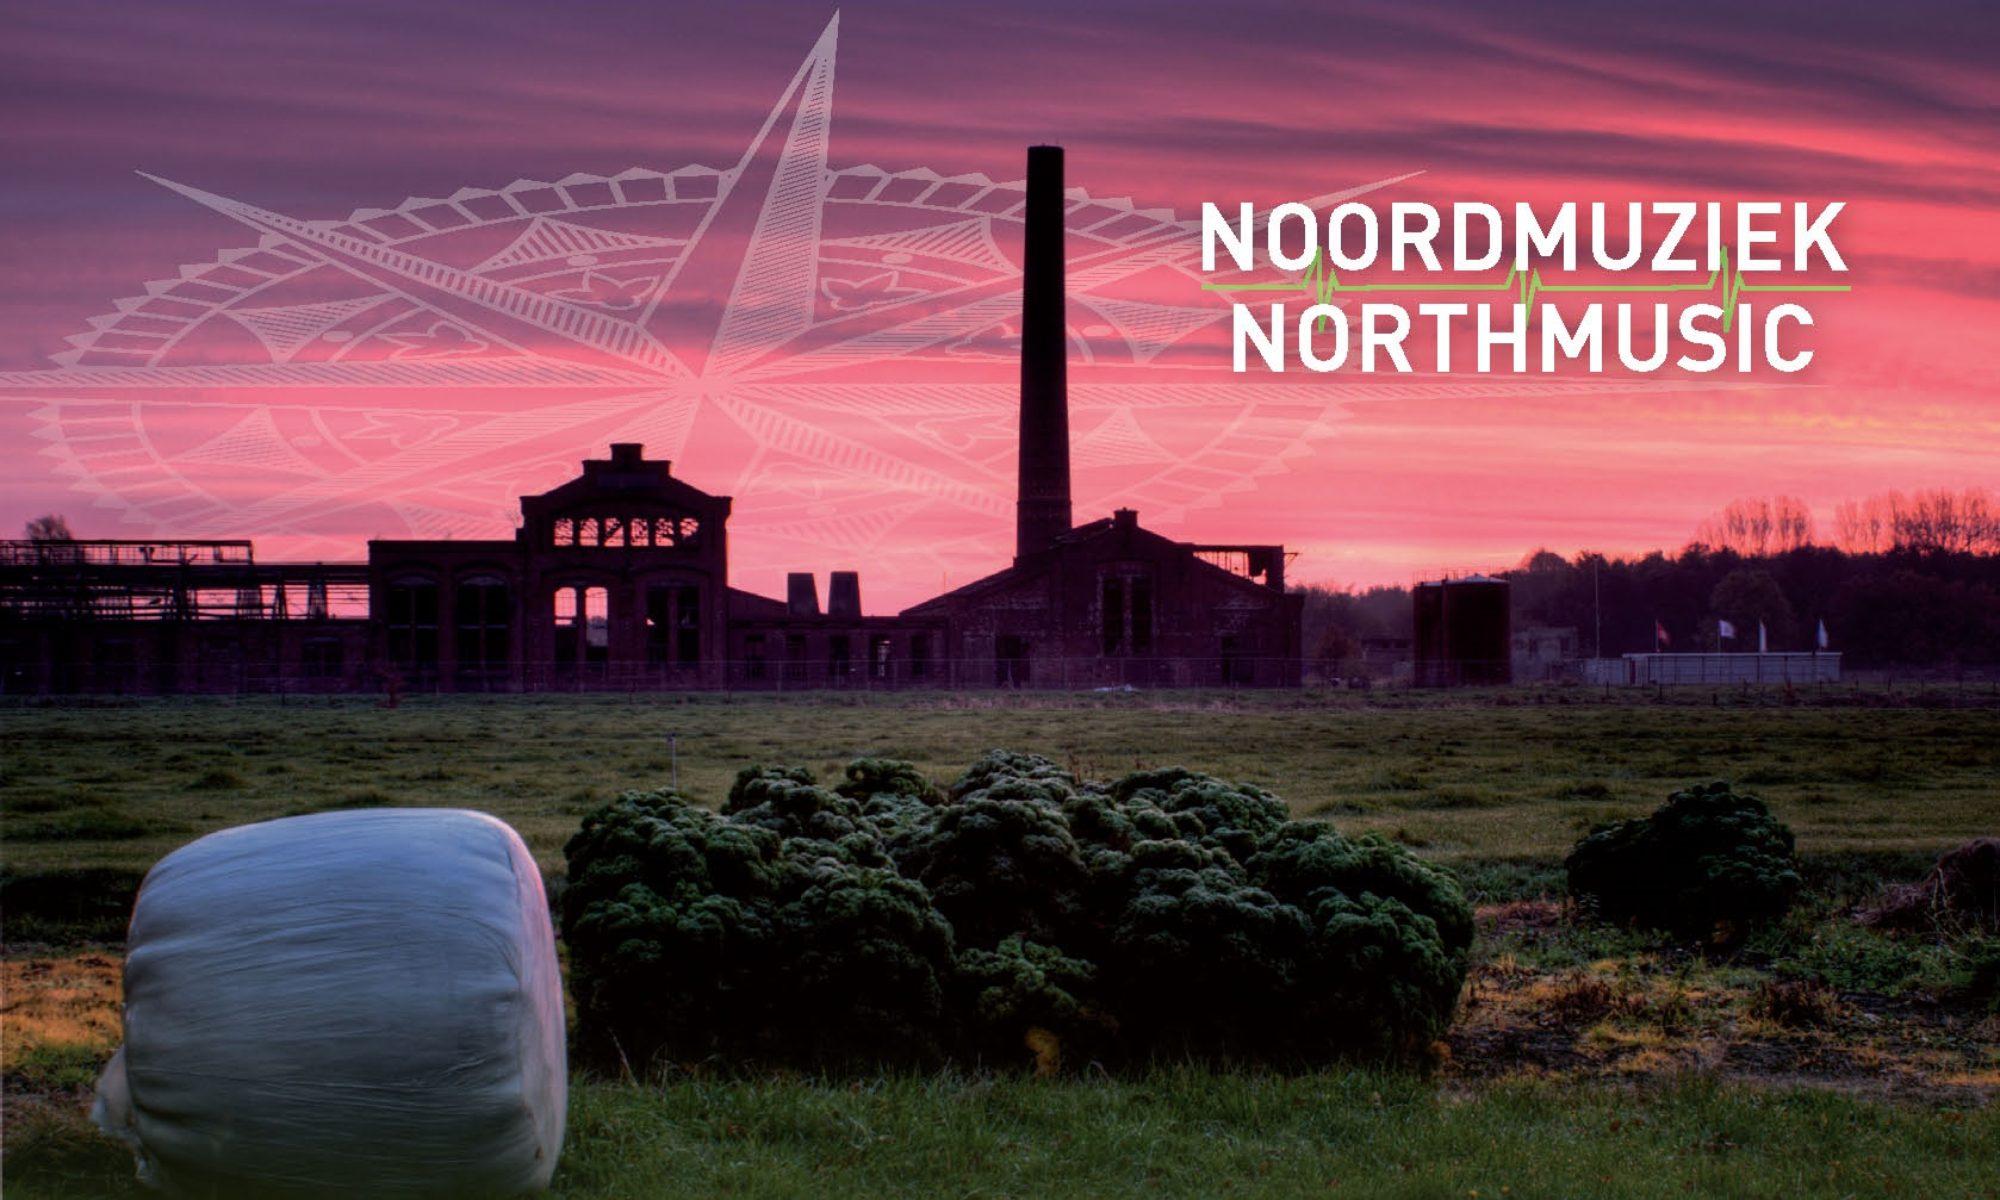 Noordmuziek - Northmusic